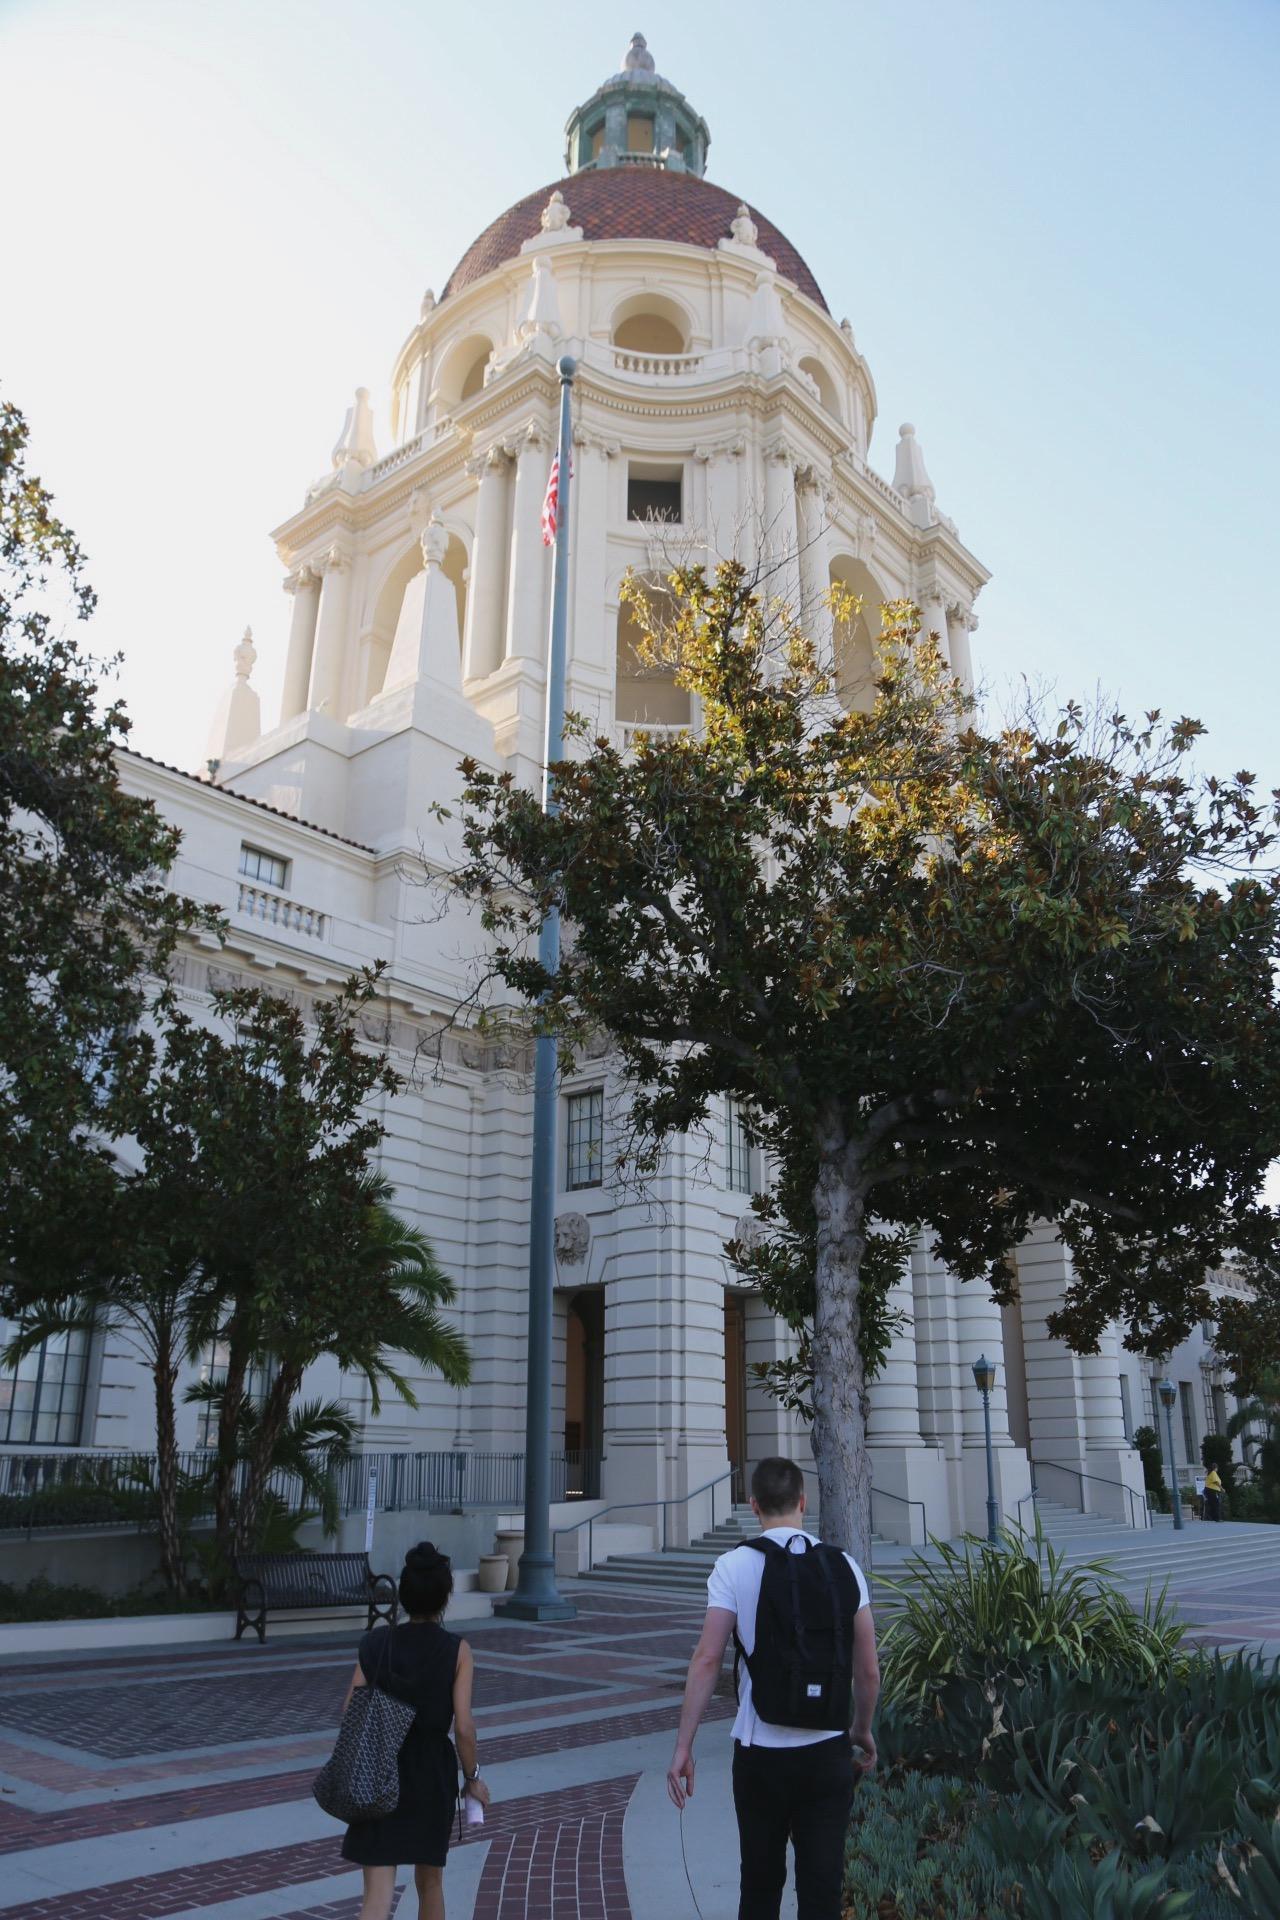 Passing through City Hall in Pasadena.